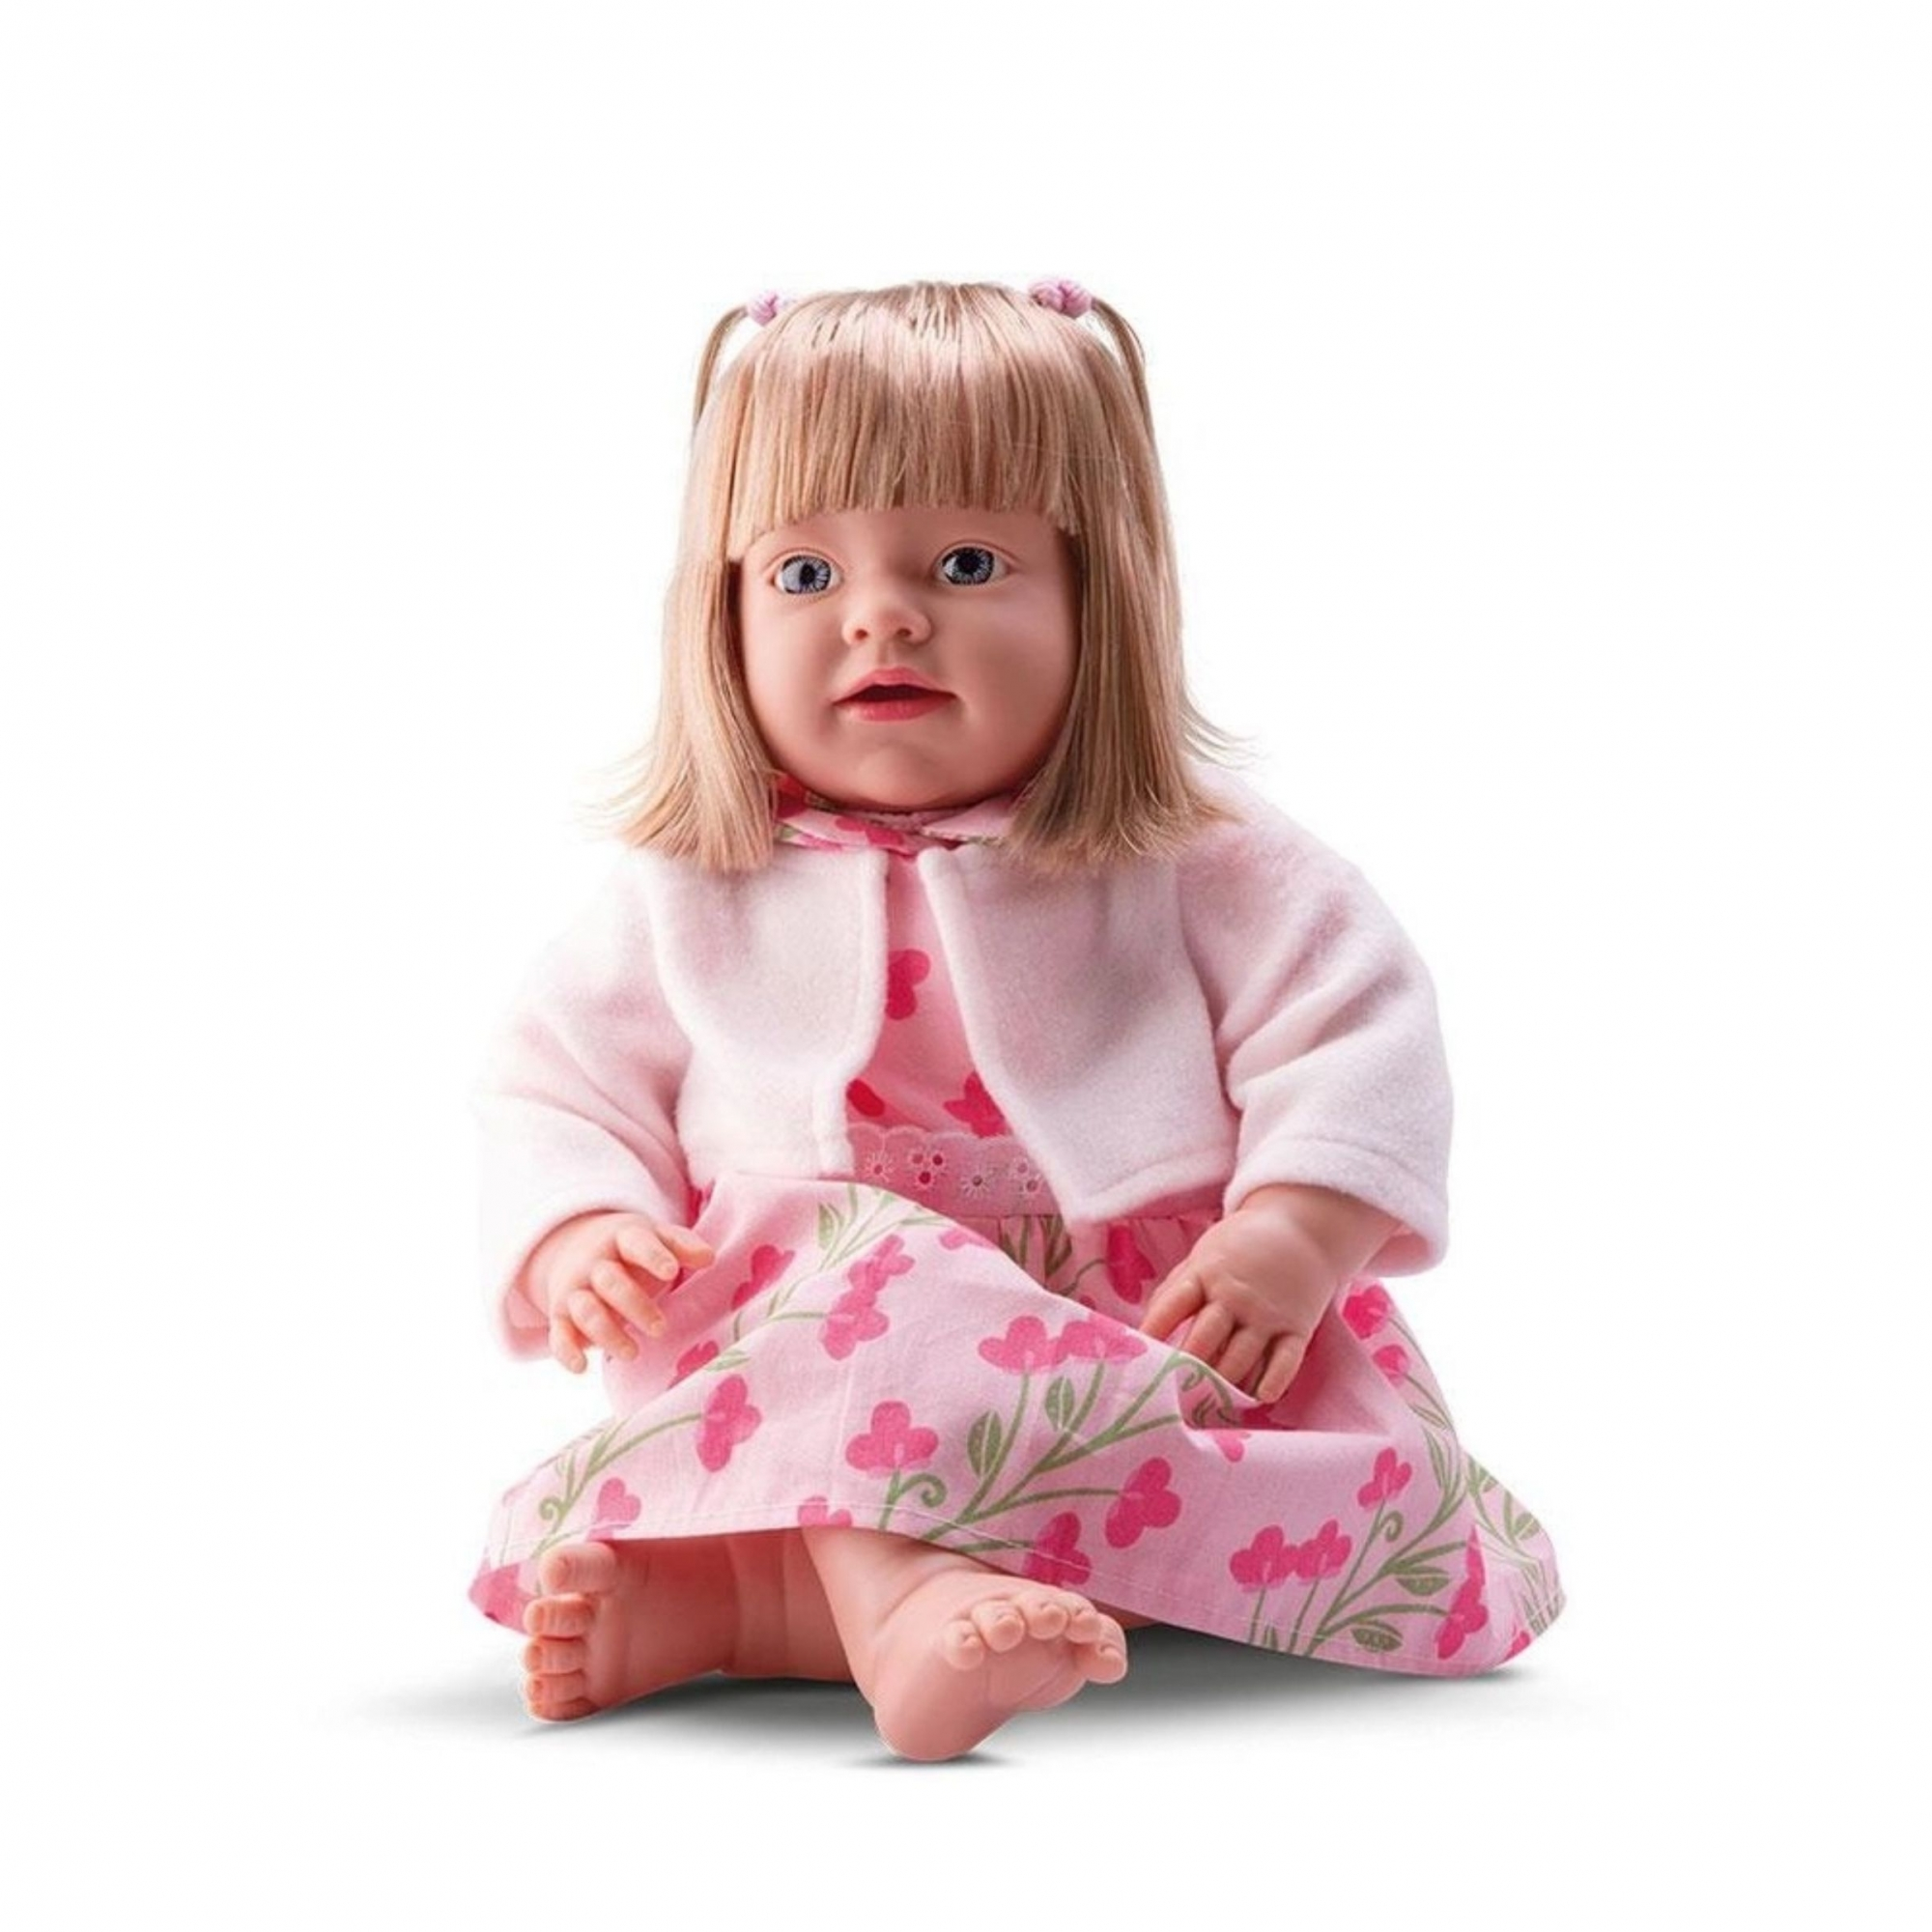 Boneca Biba Comidinha Bambola